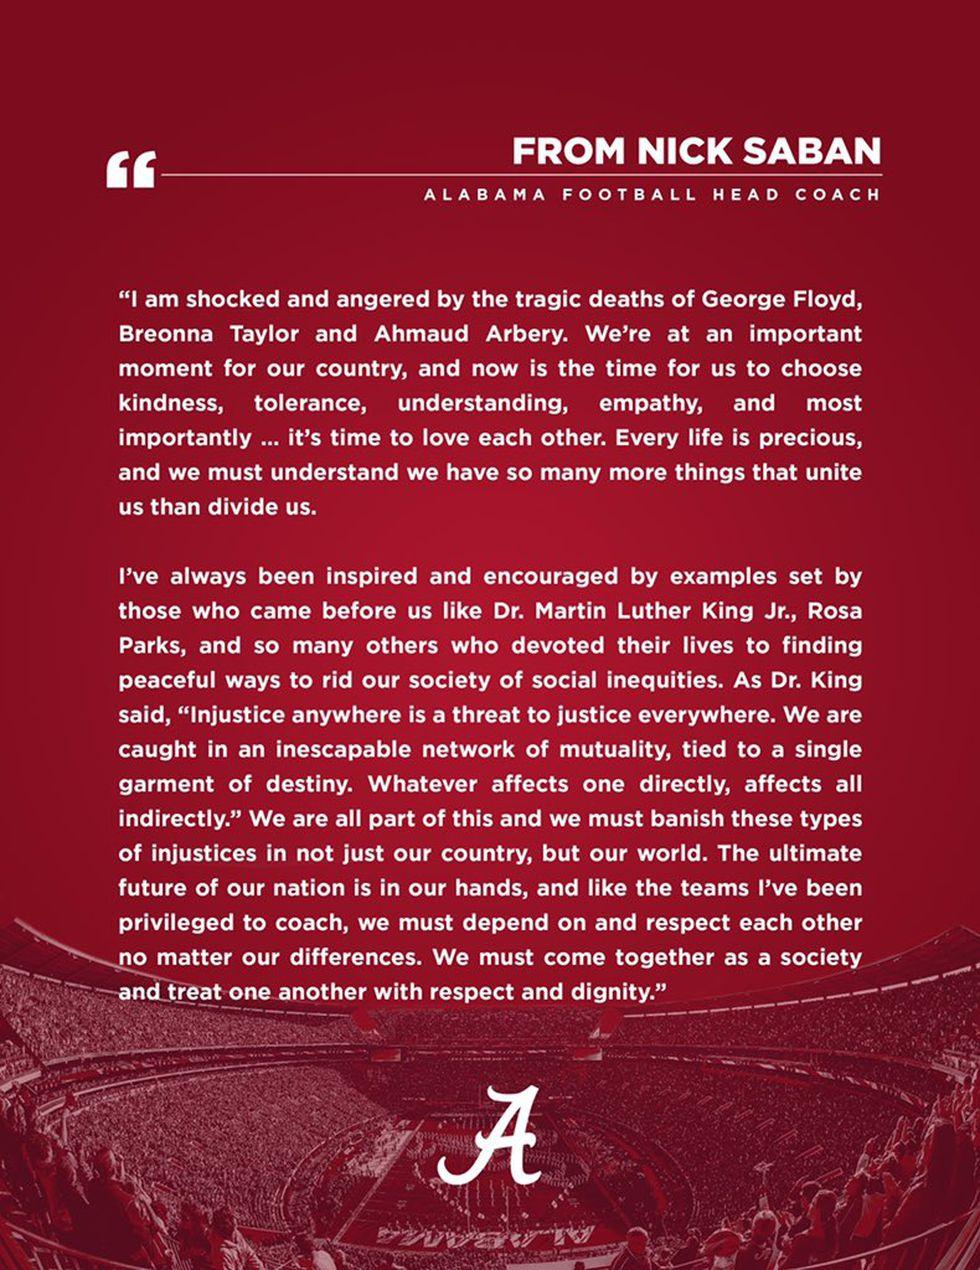 Message from Coach Nick Saban